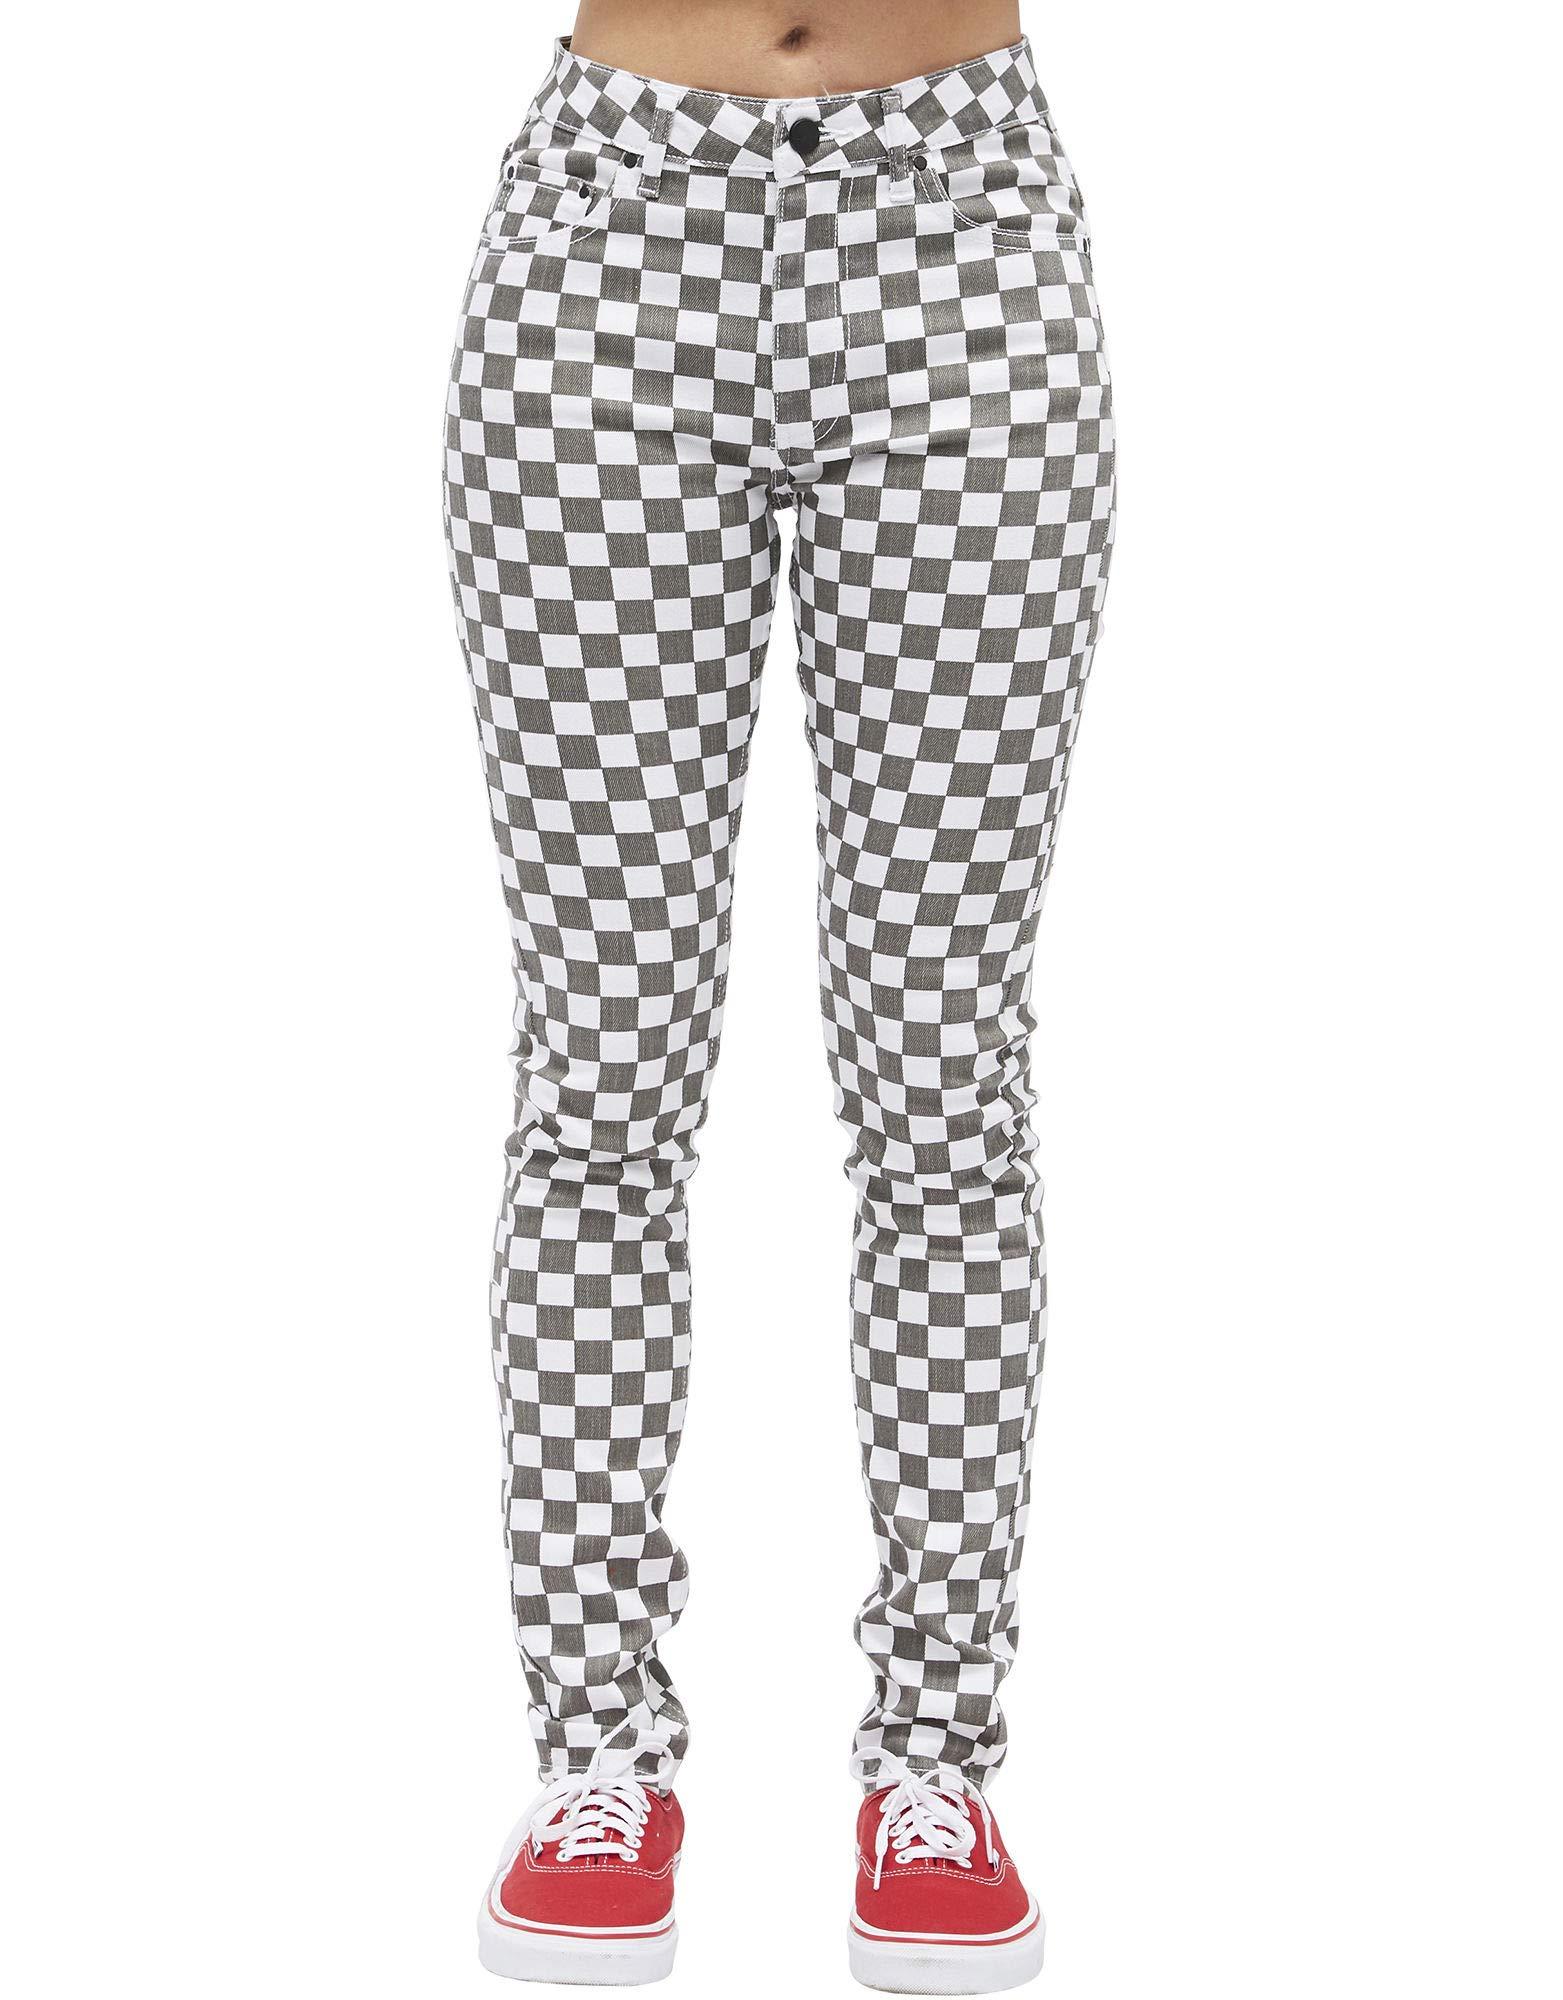 Dickies Girl Juniors' Skinny Fit 5 Pocket Checkered Pants (White/Black, 0)